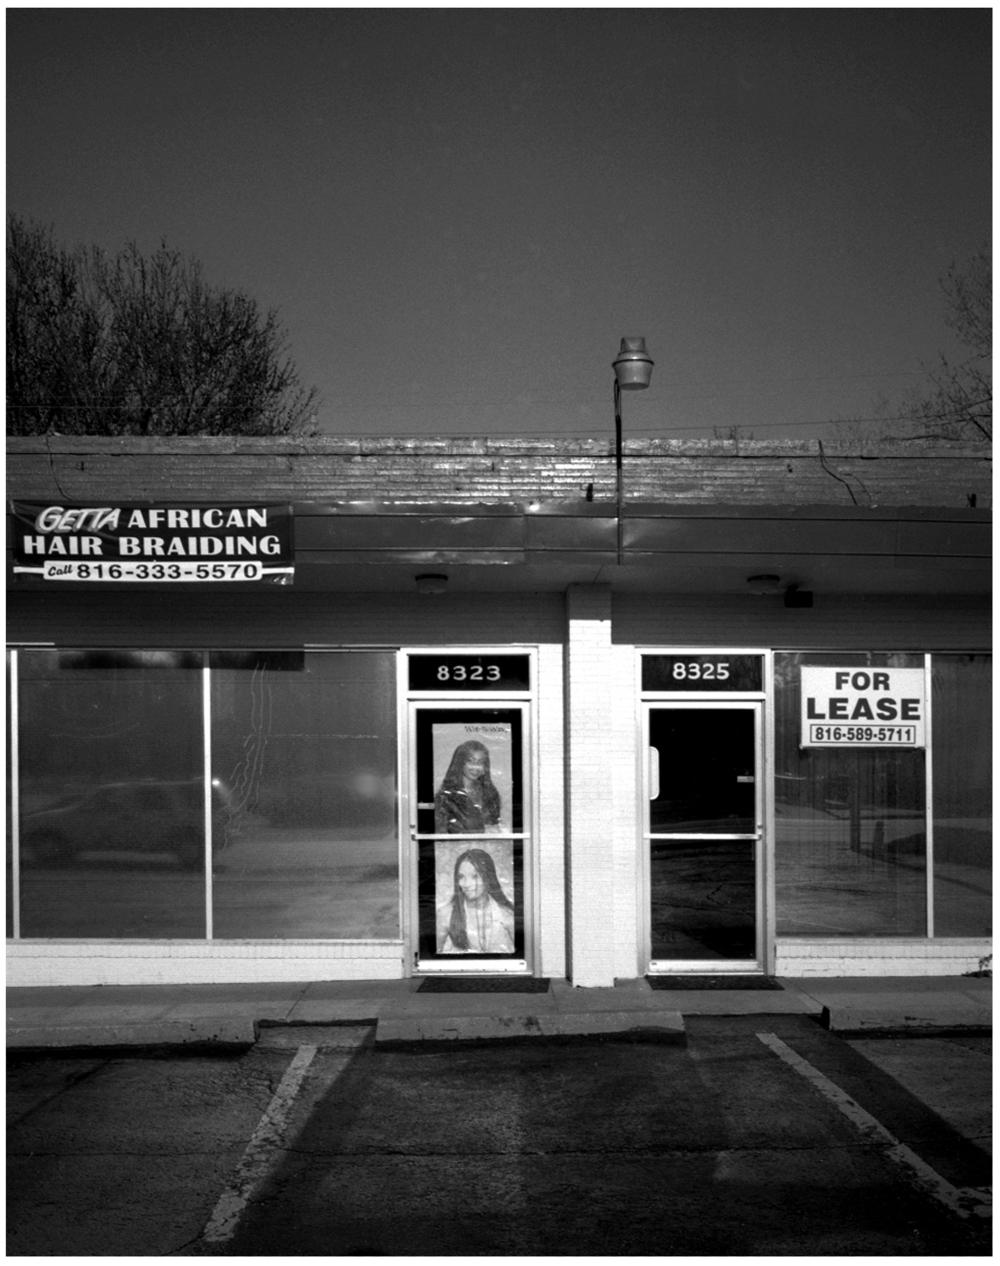 hair salon - grant edwards photography